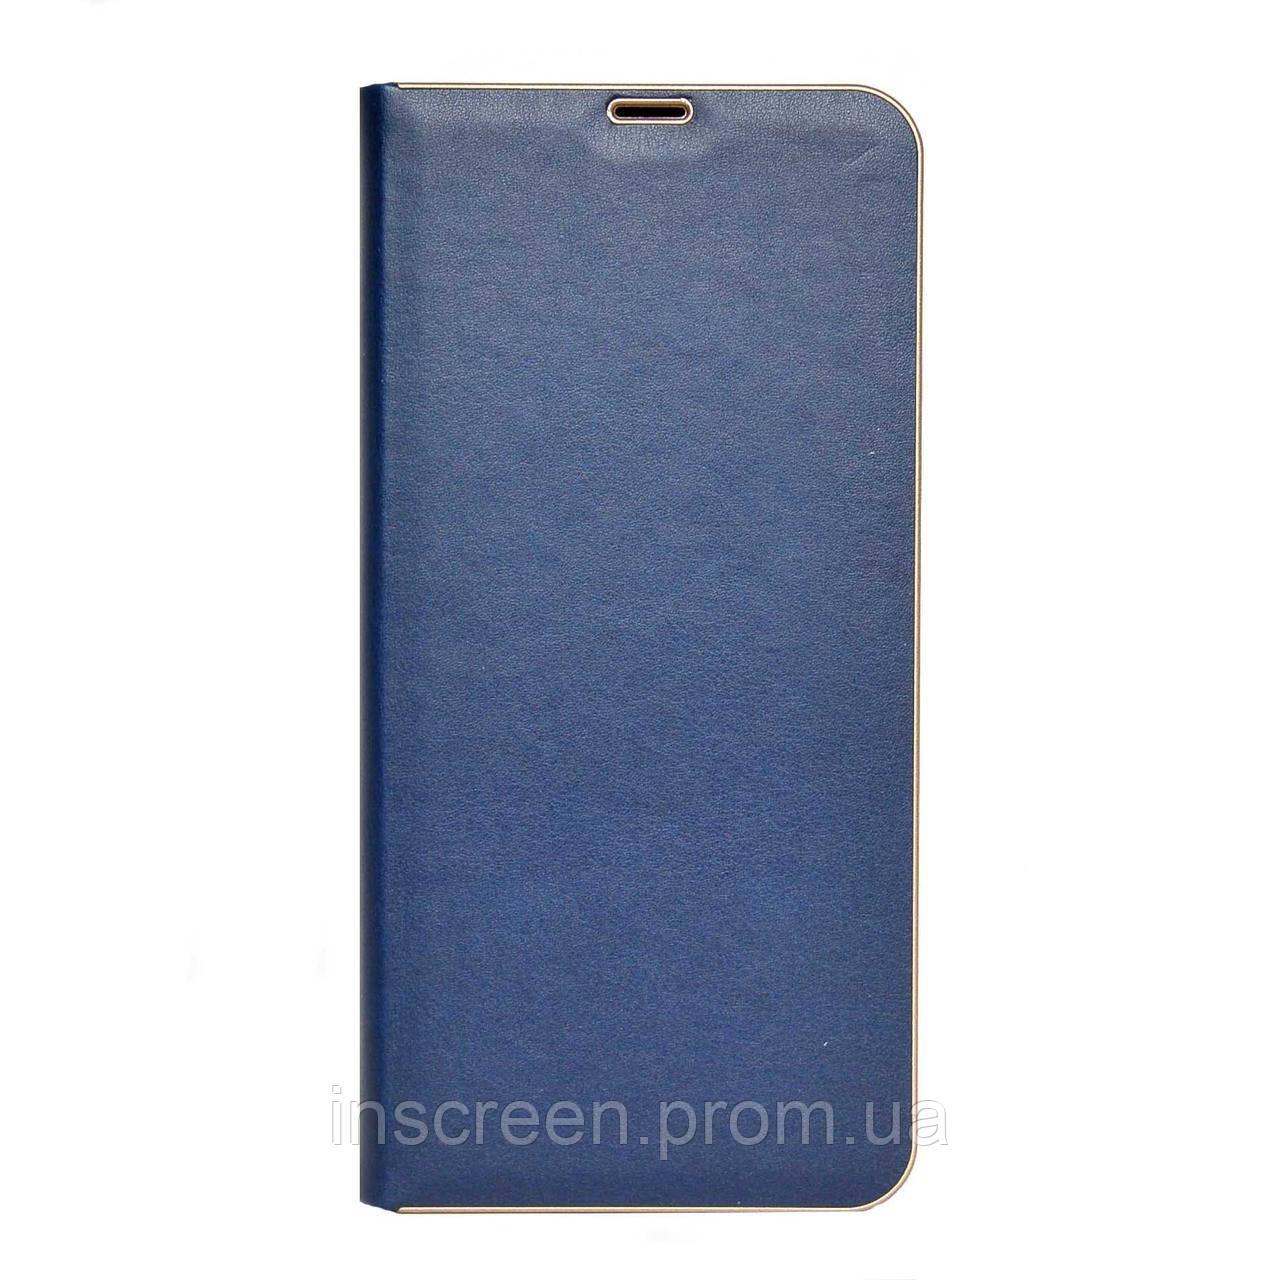 Чехол-книжка Florence TOP 2 Samsung A015F A01 (2020) синий